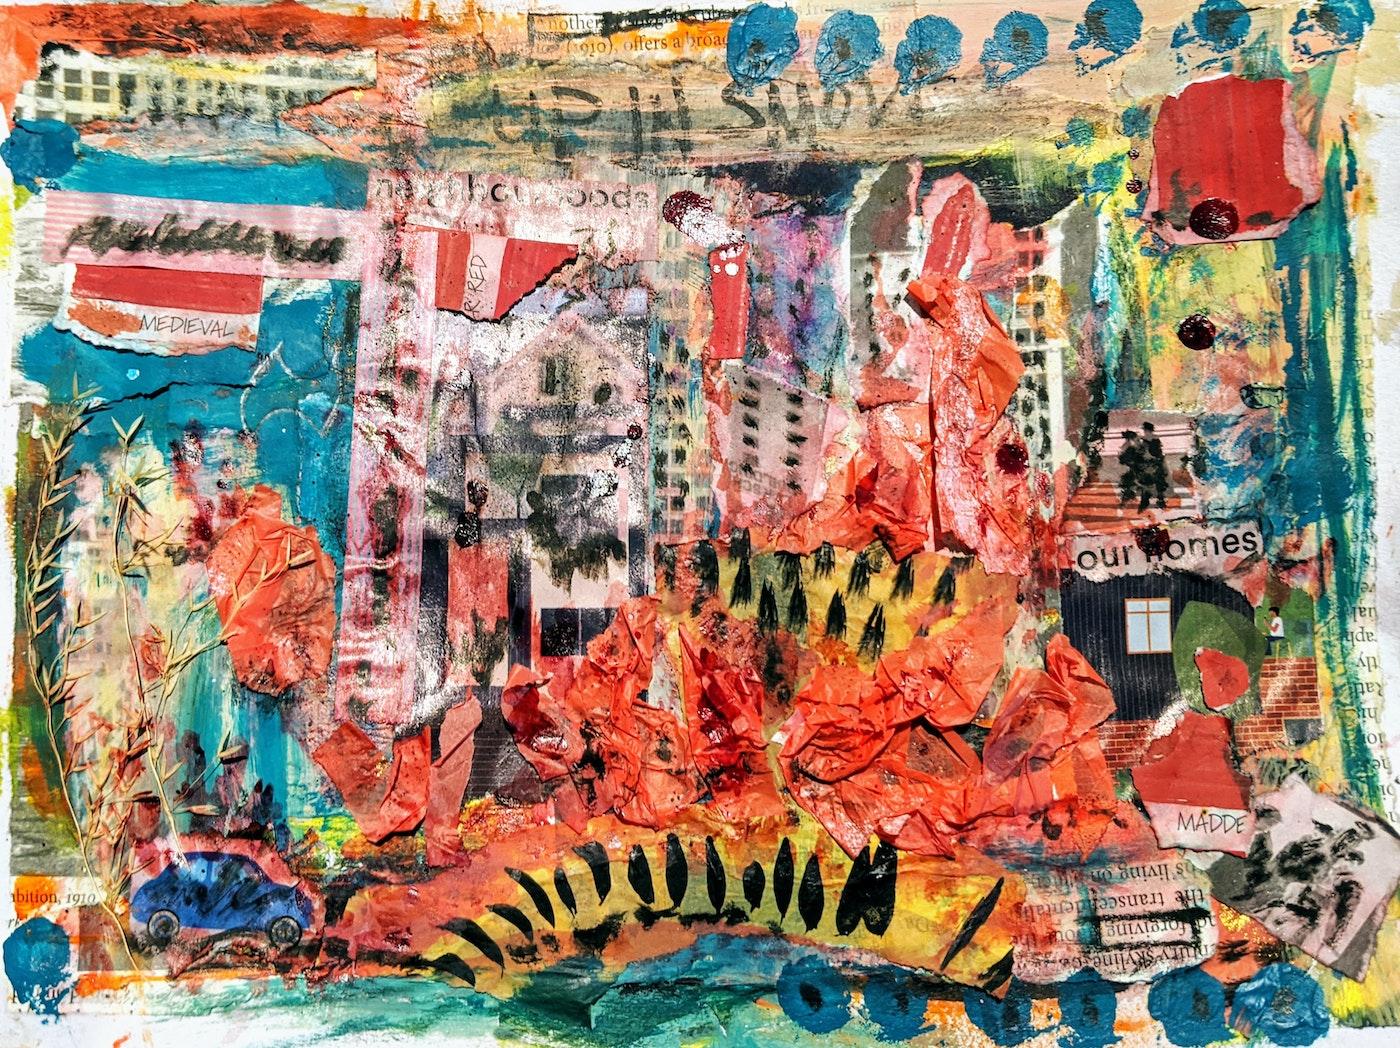 Jodie Cooper artwork